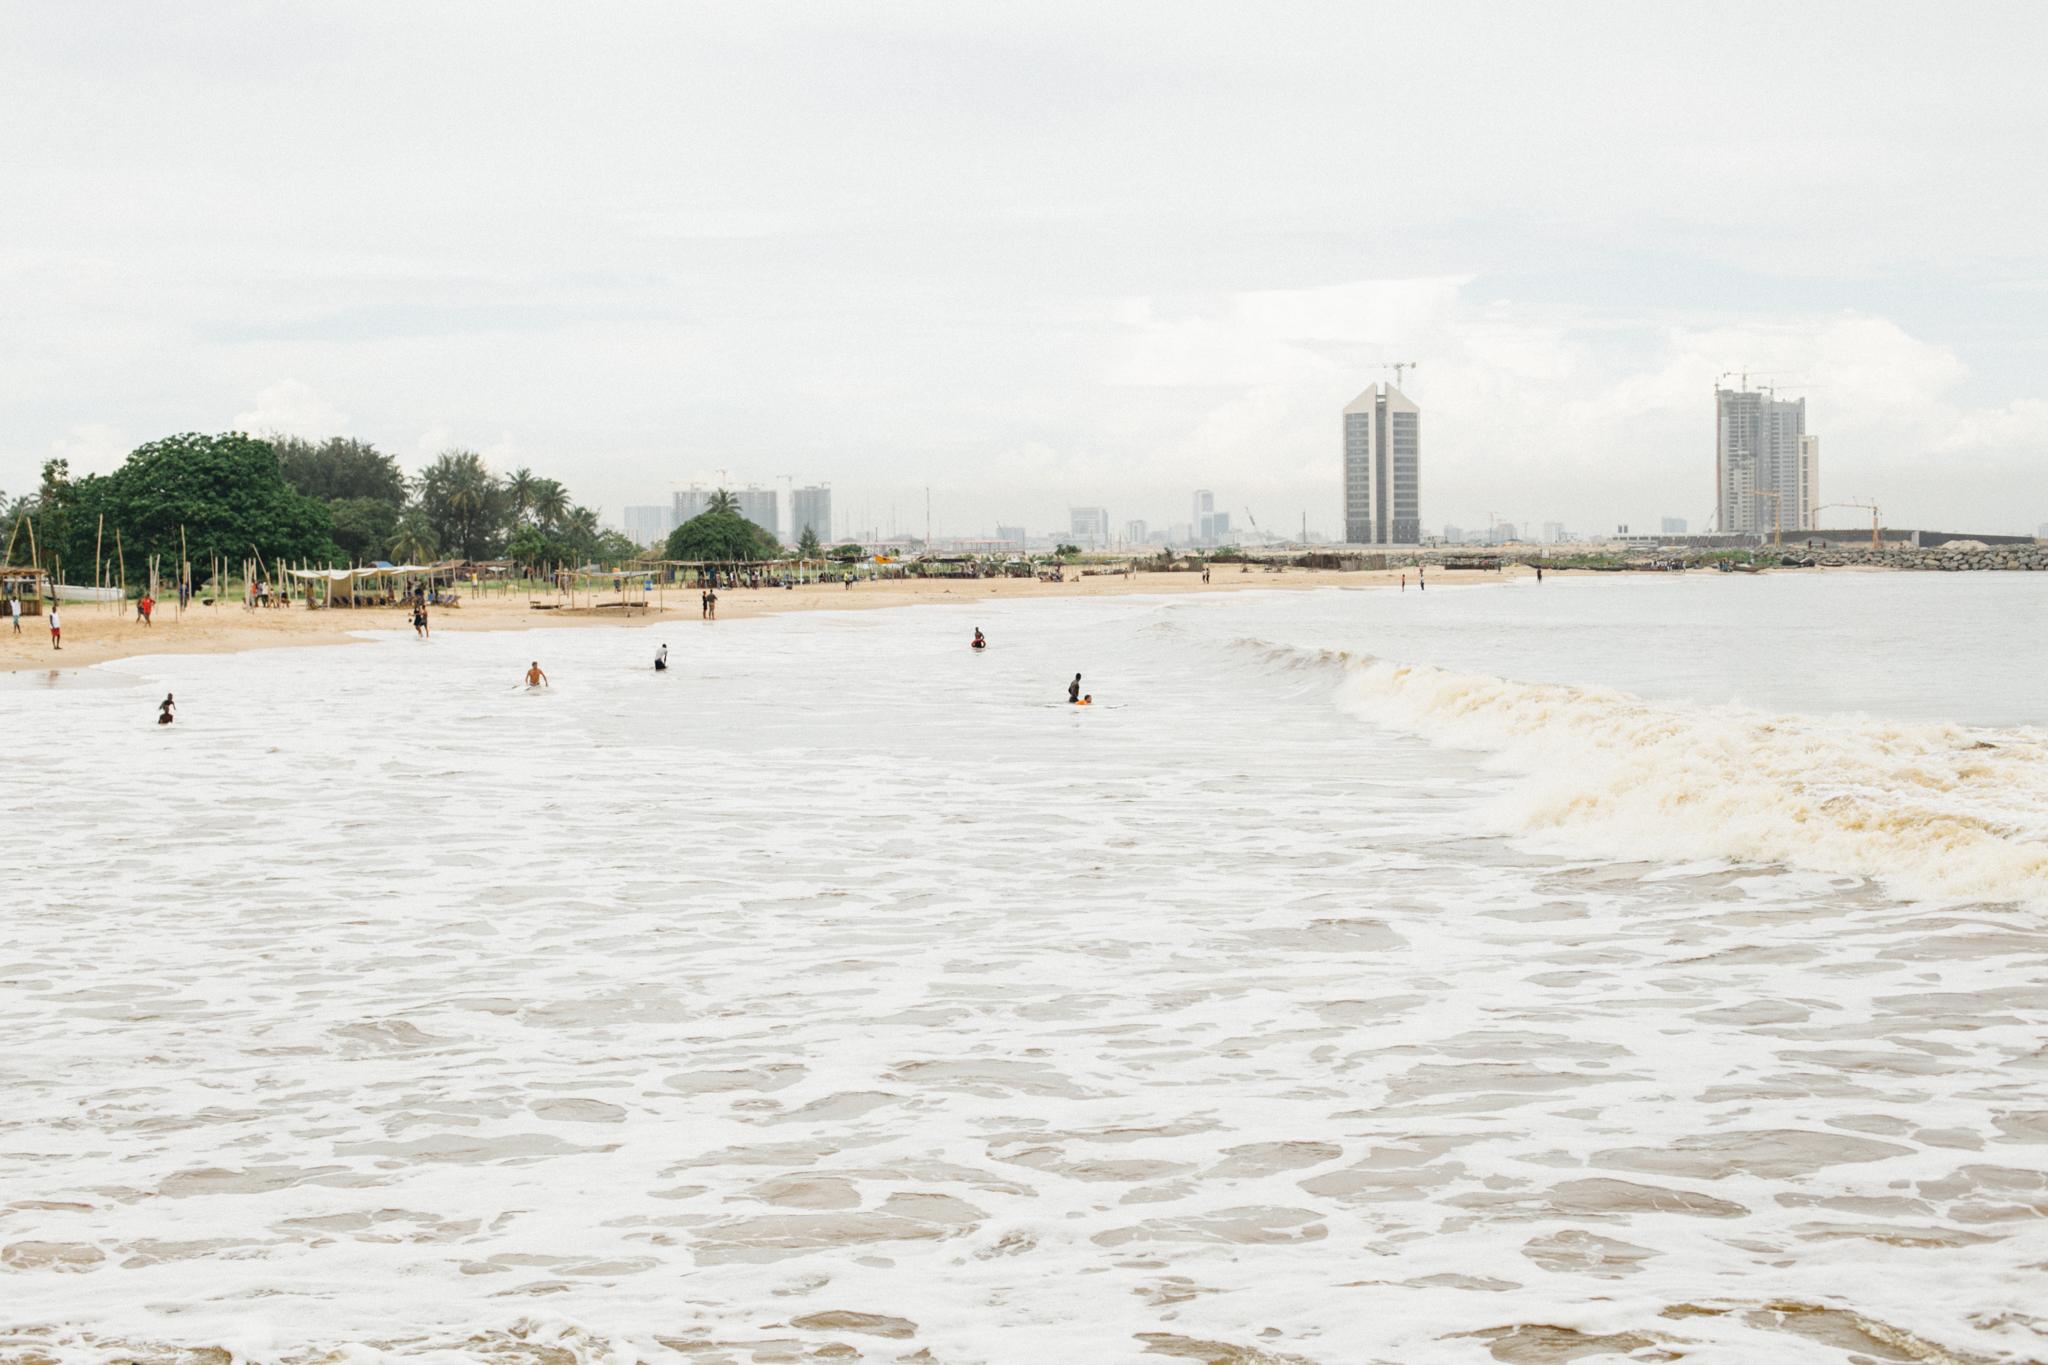 Eko Atlantic Skyline from Tarkwa Bay Beach